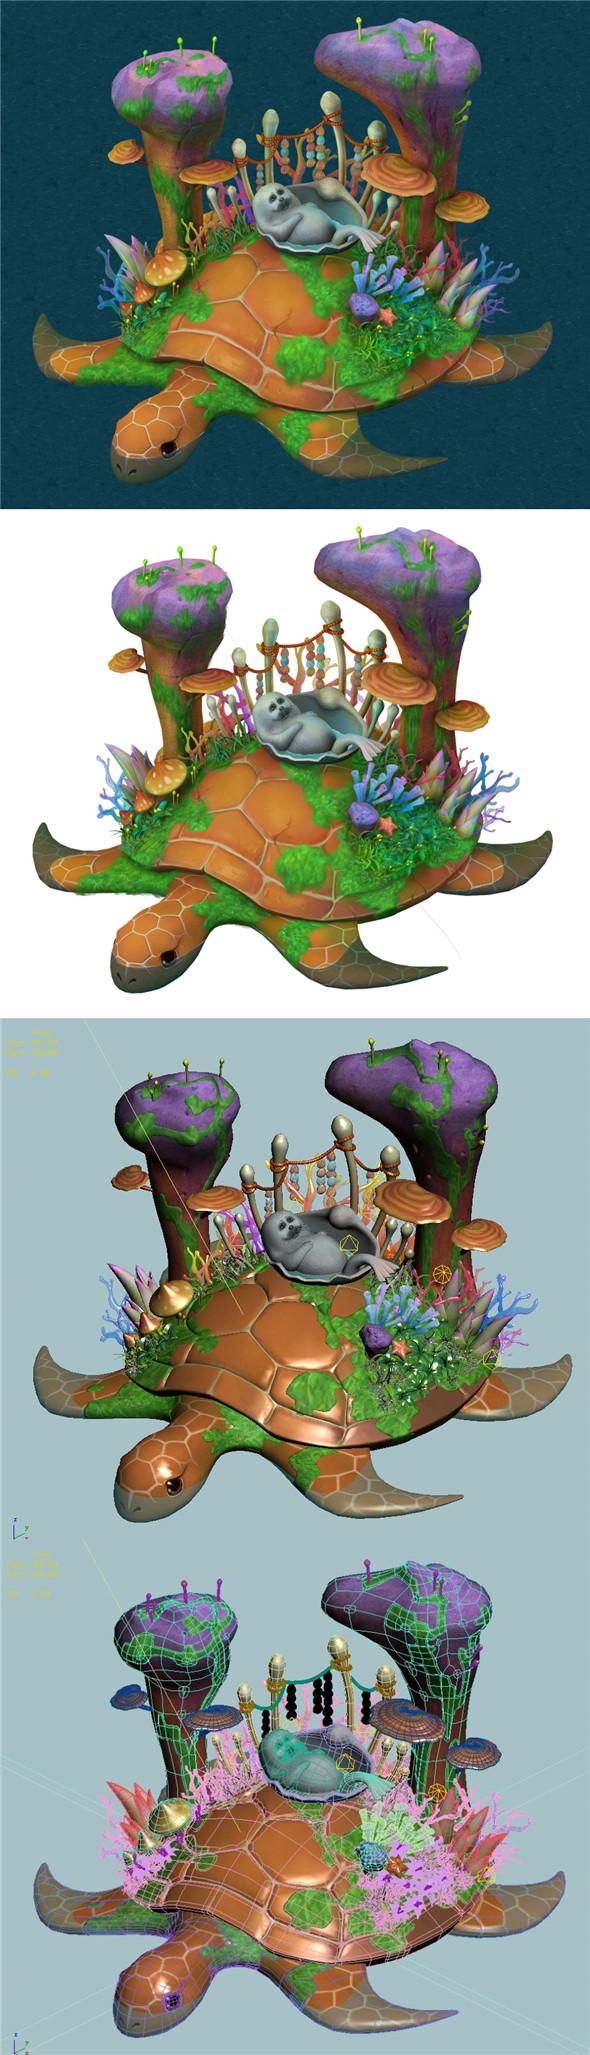 Cartoon version - seabed entrance - 3DOcean Item for Sale